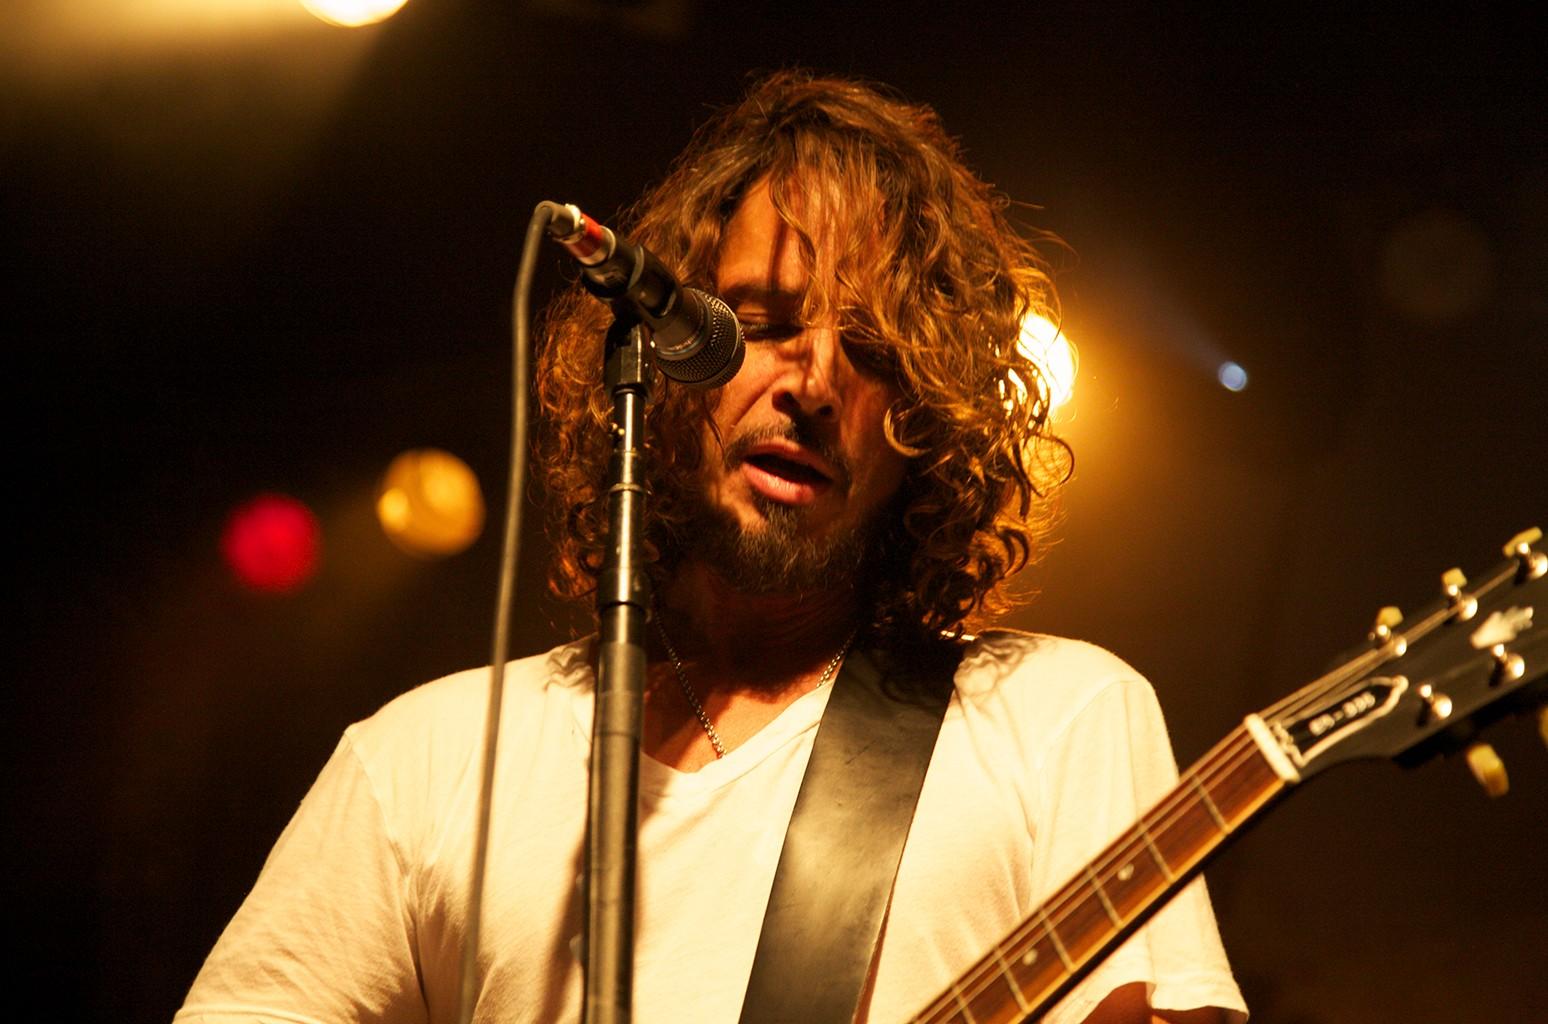 Chris Cornell of Soundgarden performing live in Toronto on Nov. 16 2012.